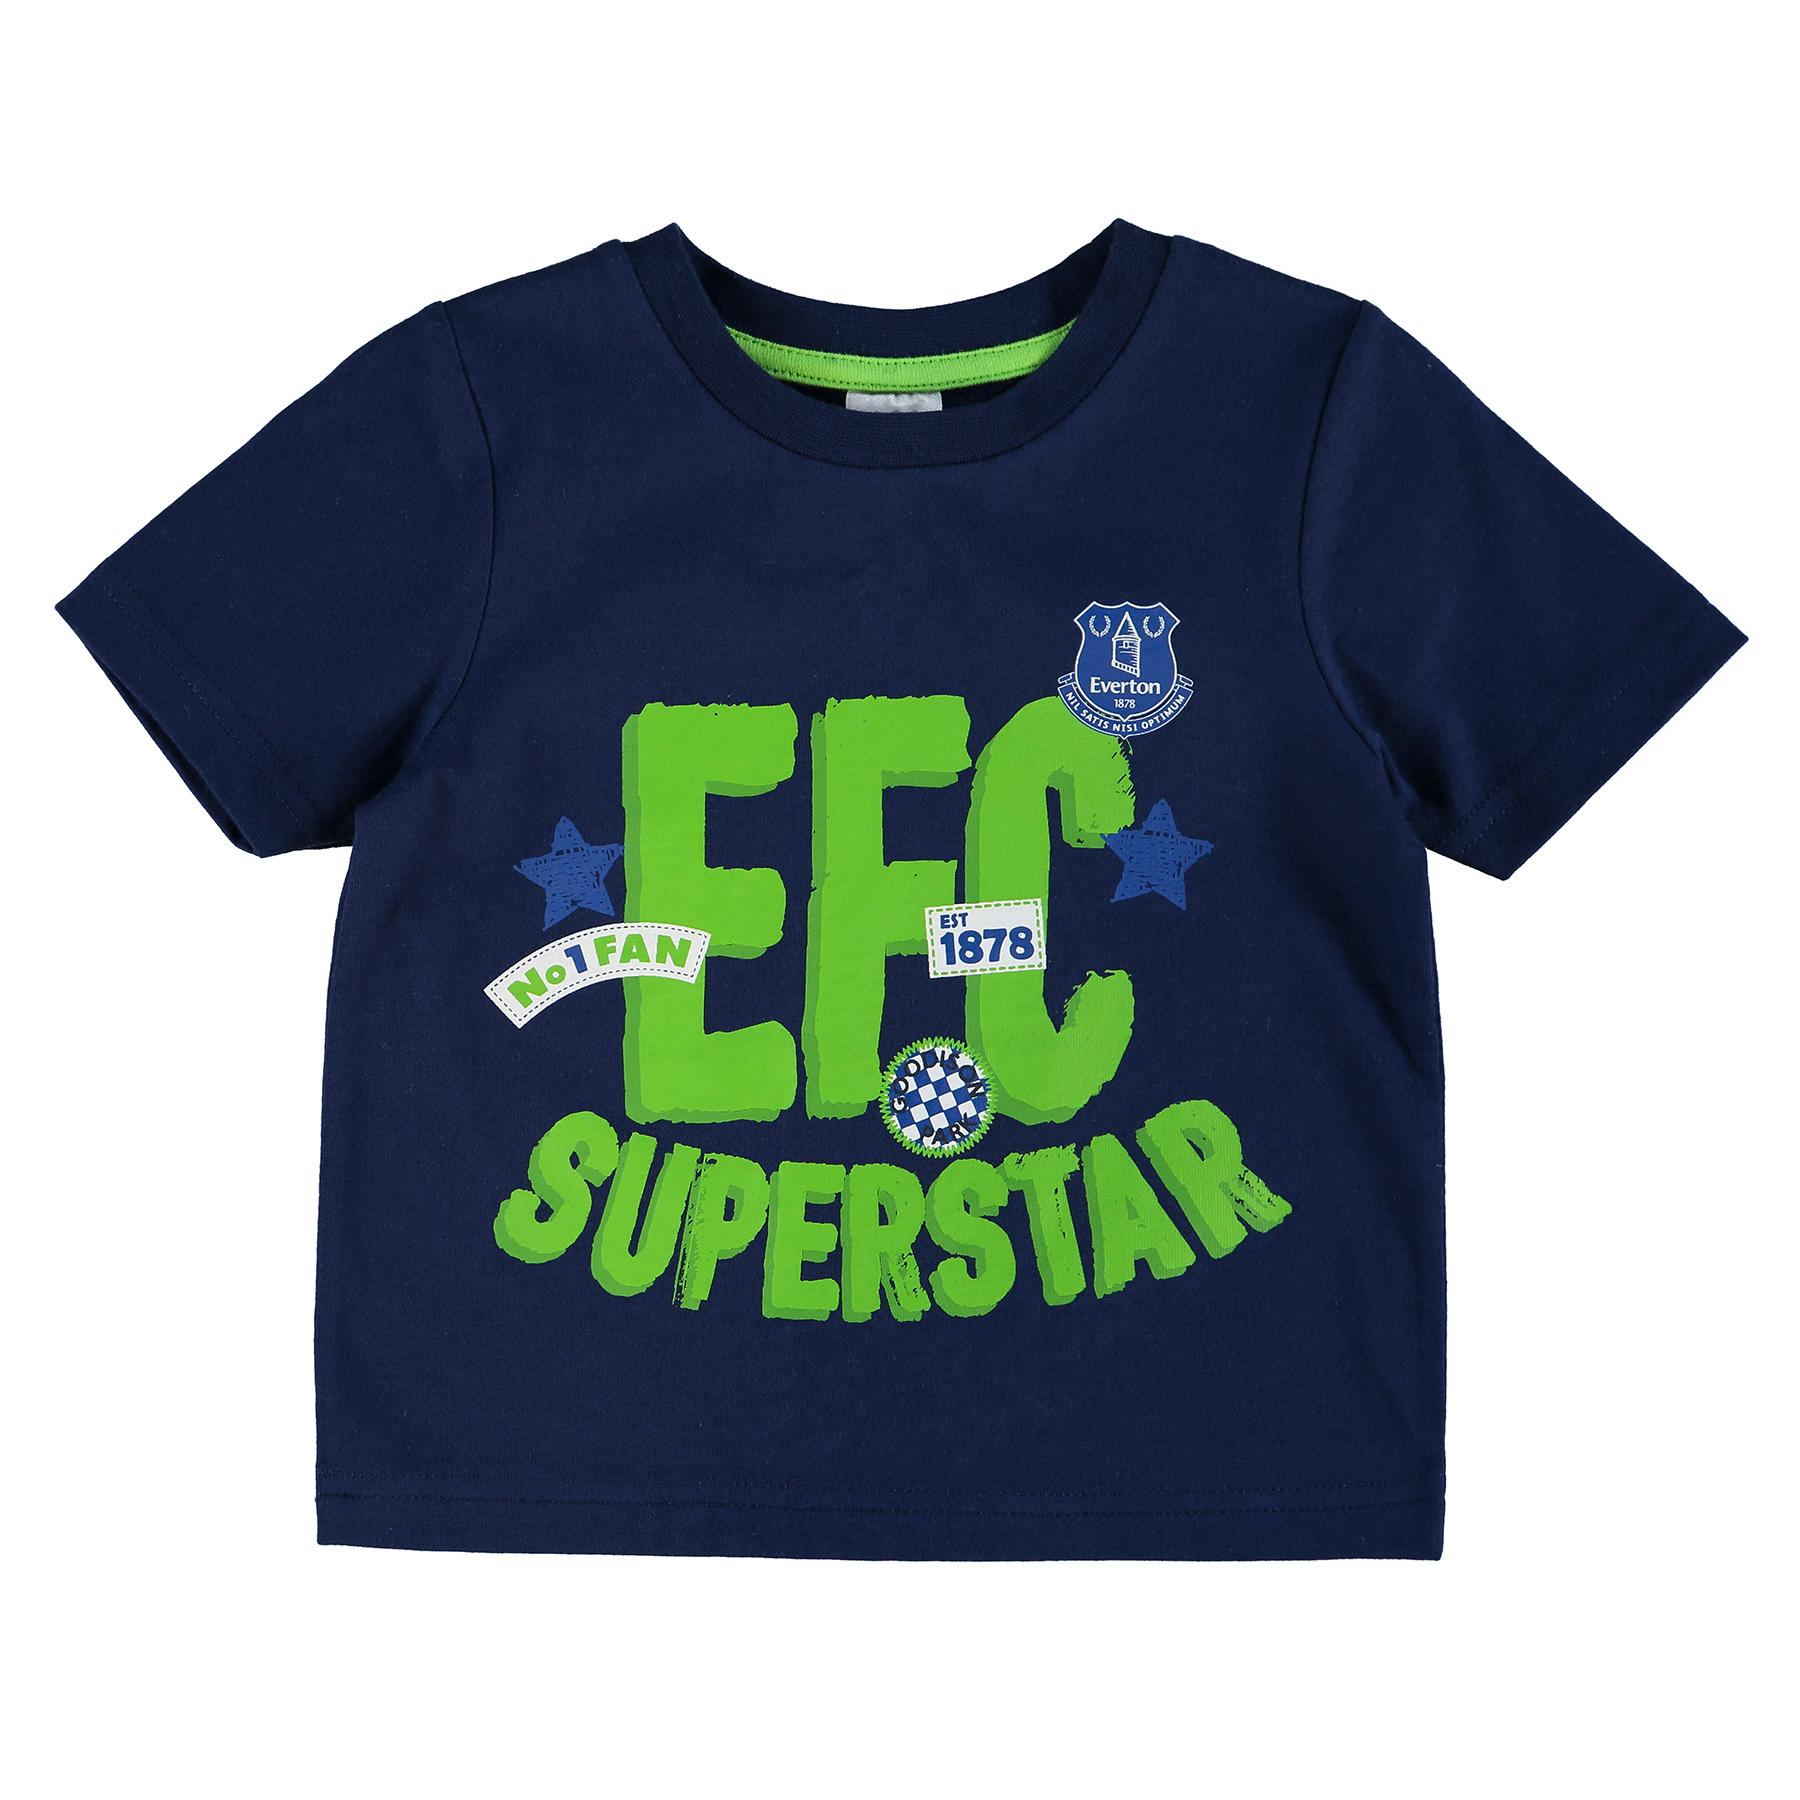 Everton Star T-Shirt - Navy - Baby